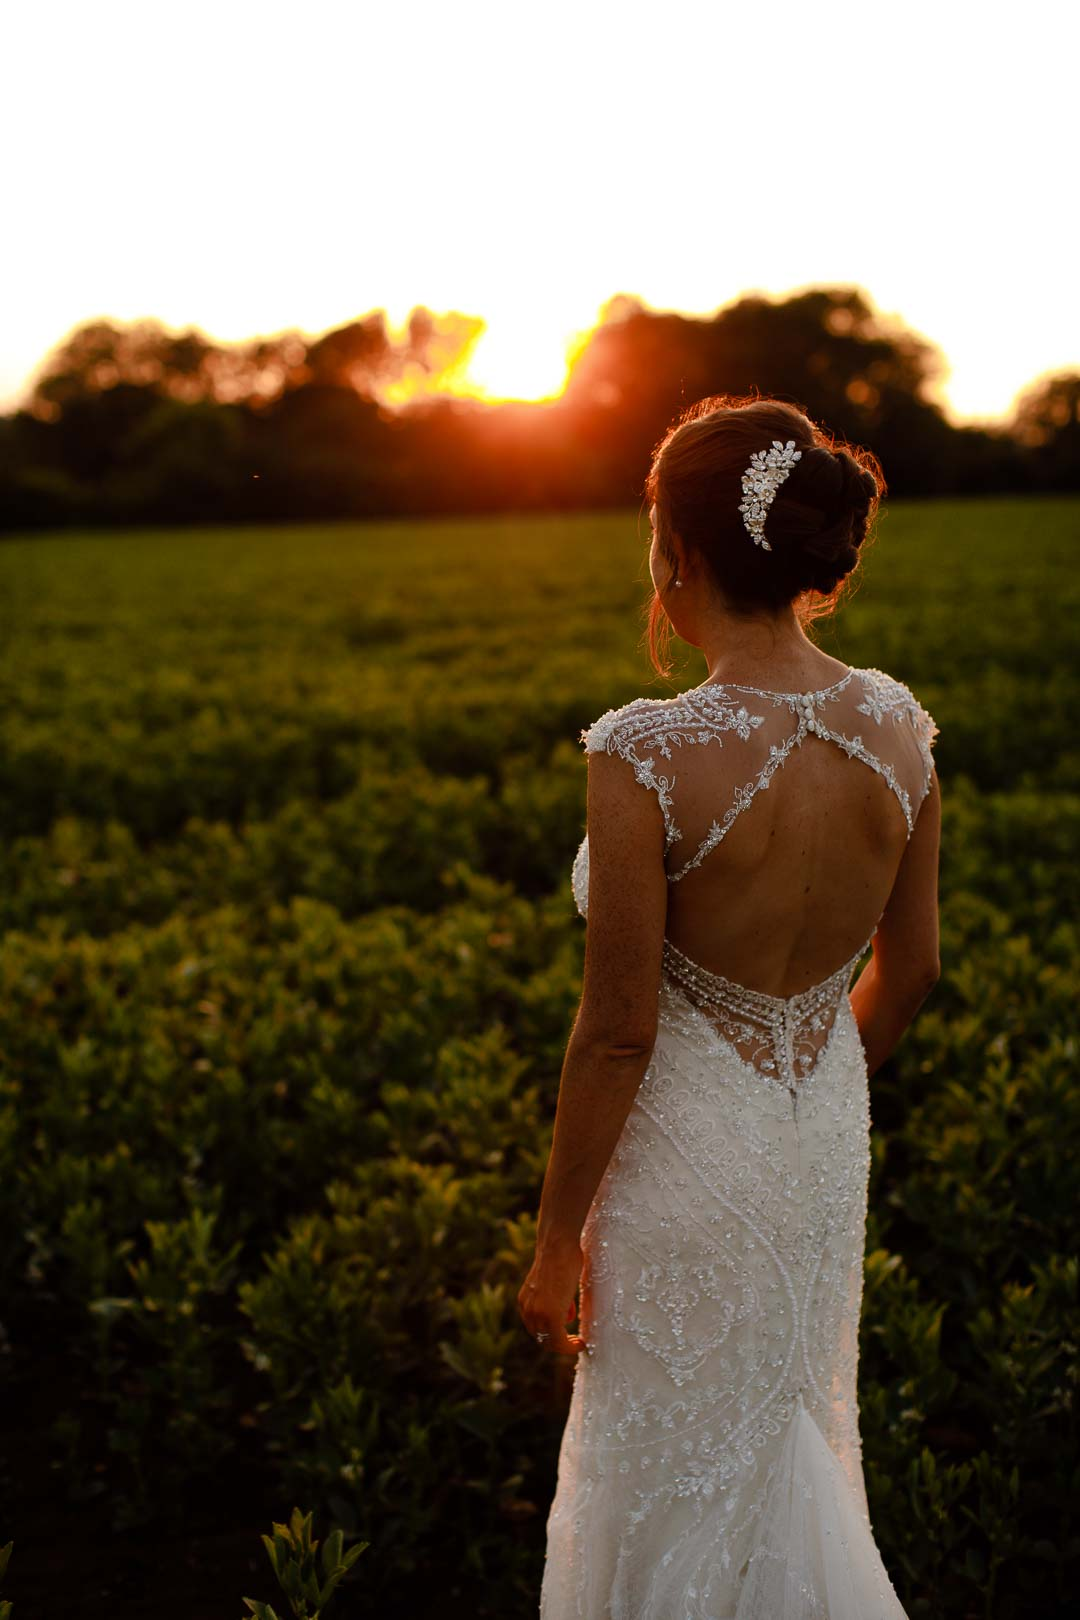 walking through the sunset fields